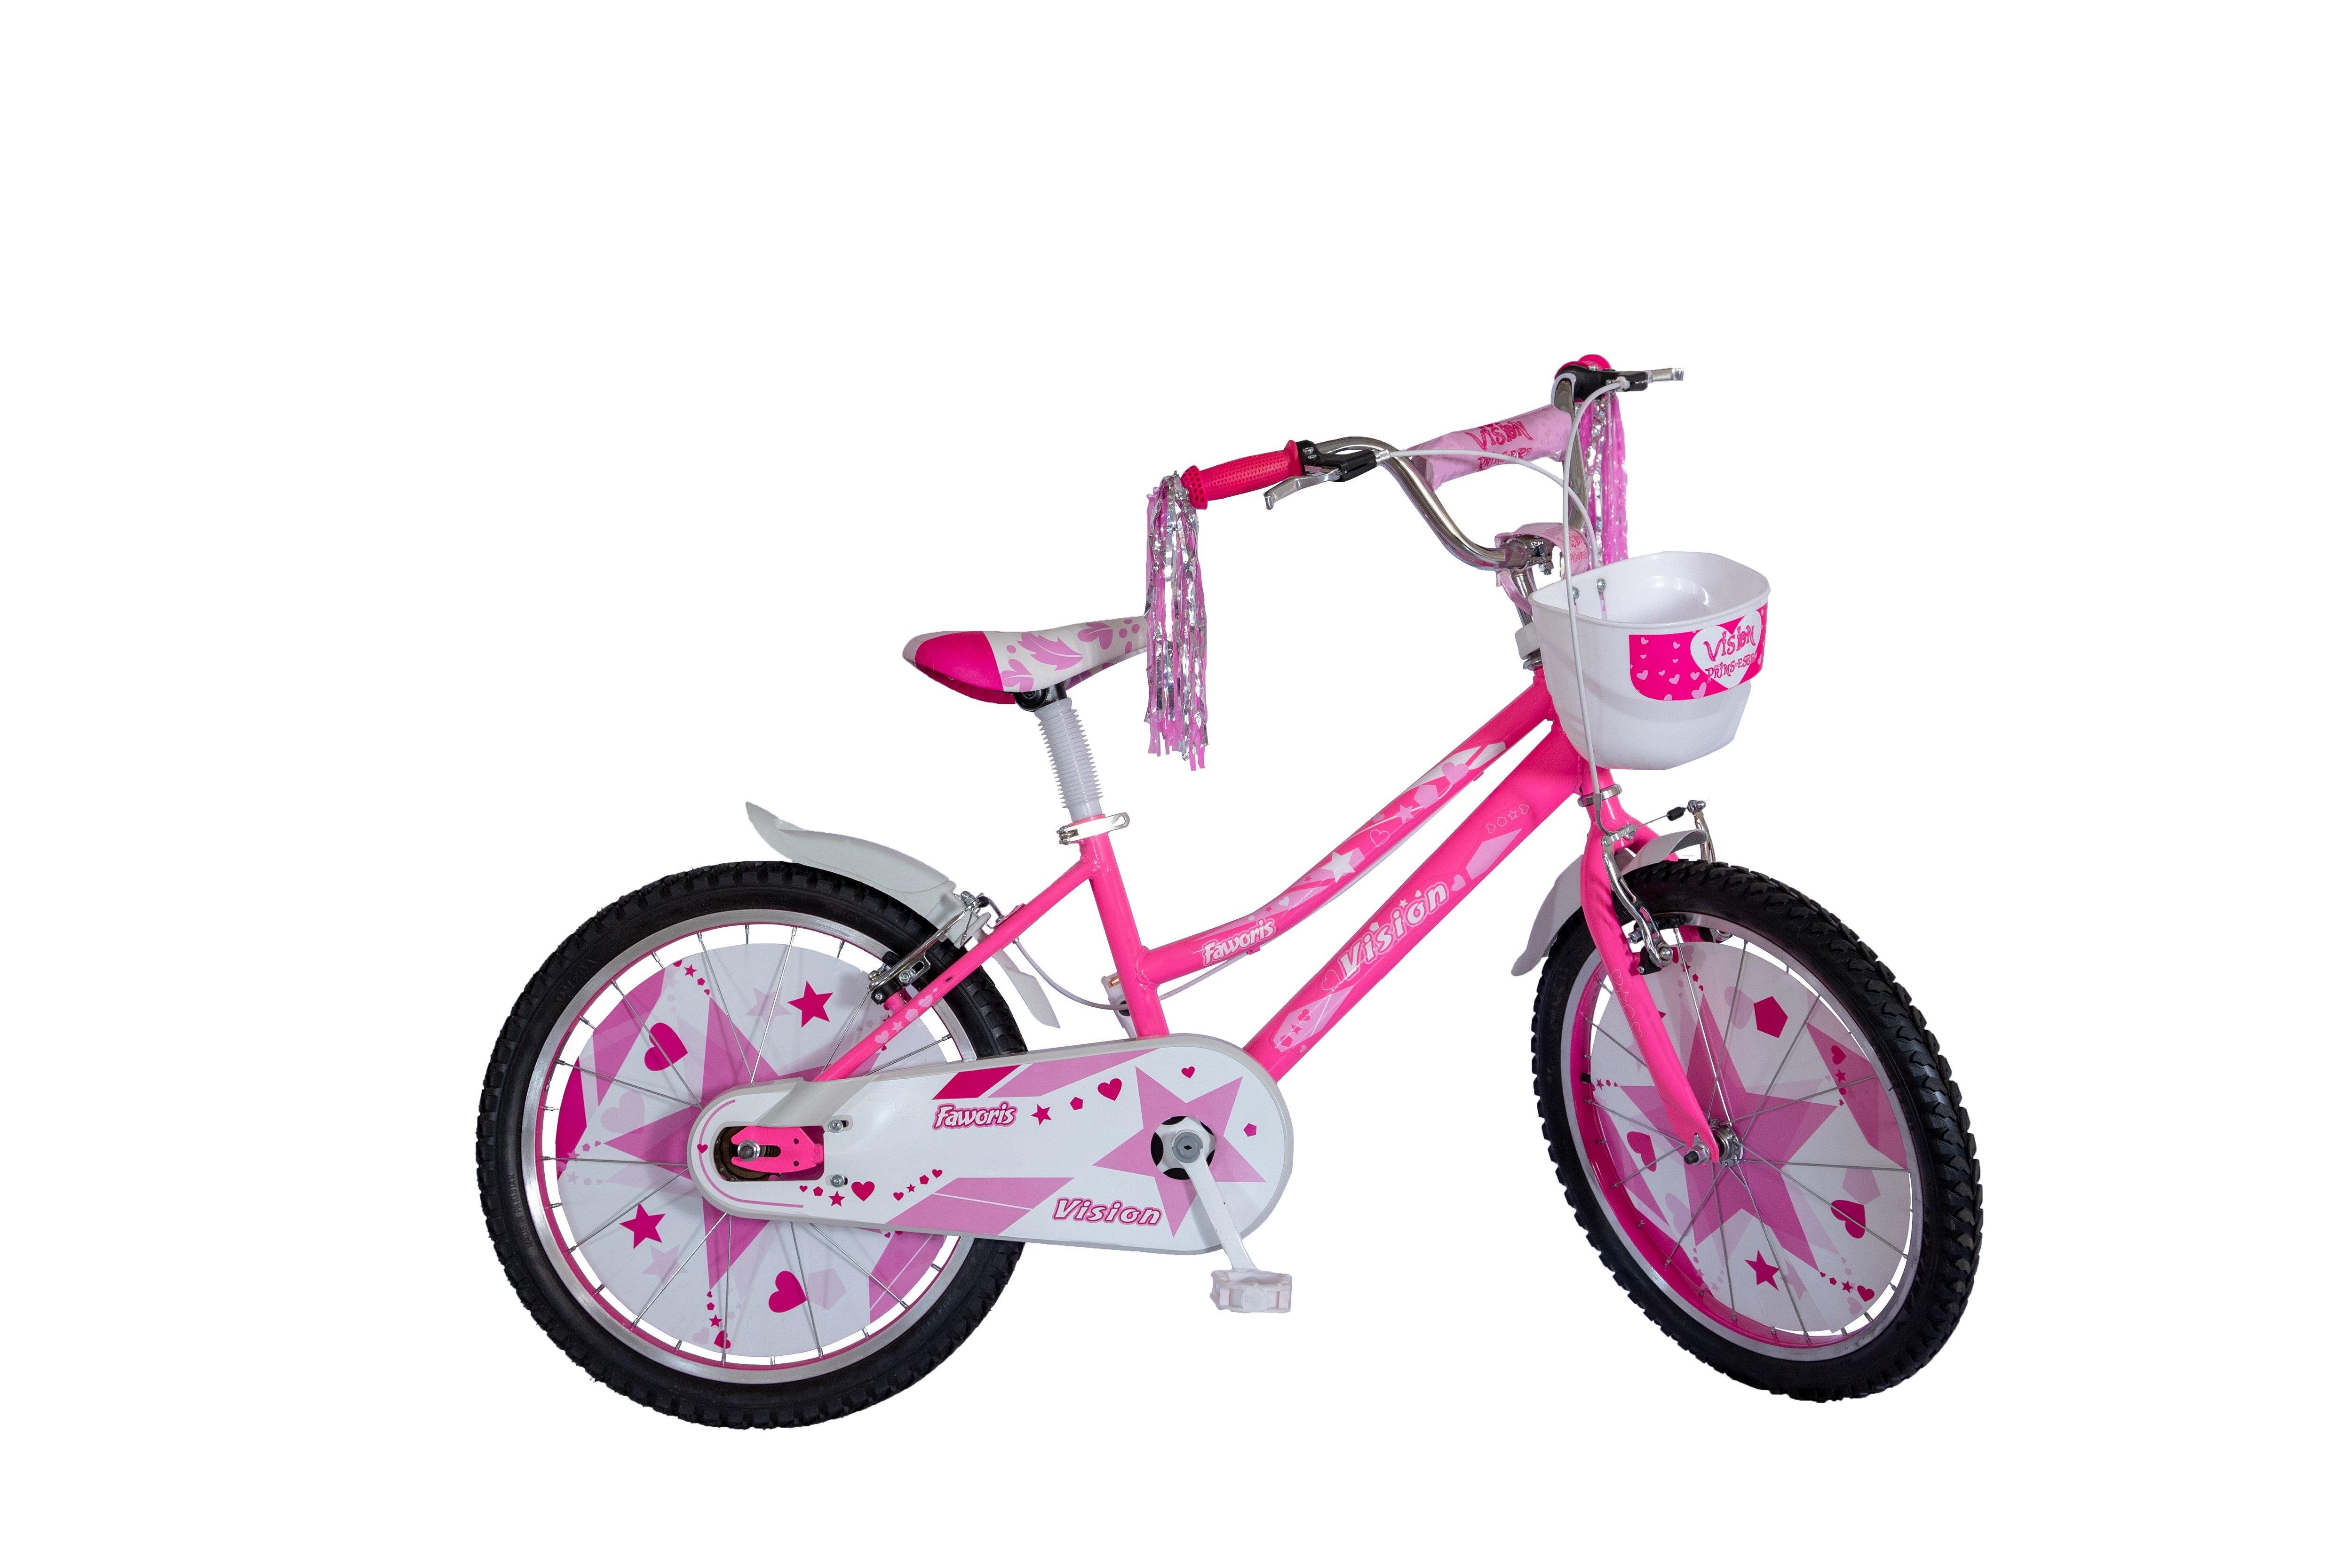 "Bicicleta Copii Vision Faworis Culoare Roz/Alb Roata 20"" Otel [0]"